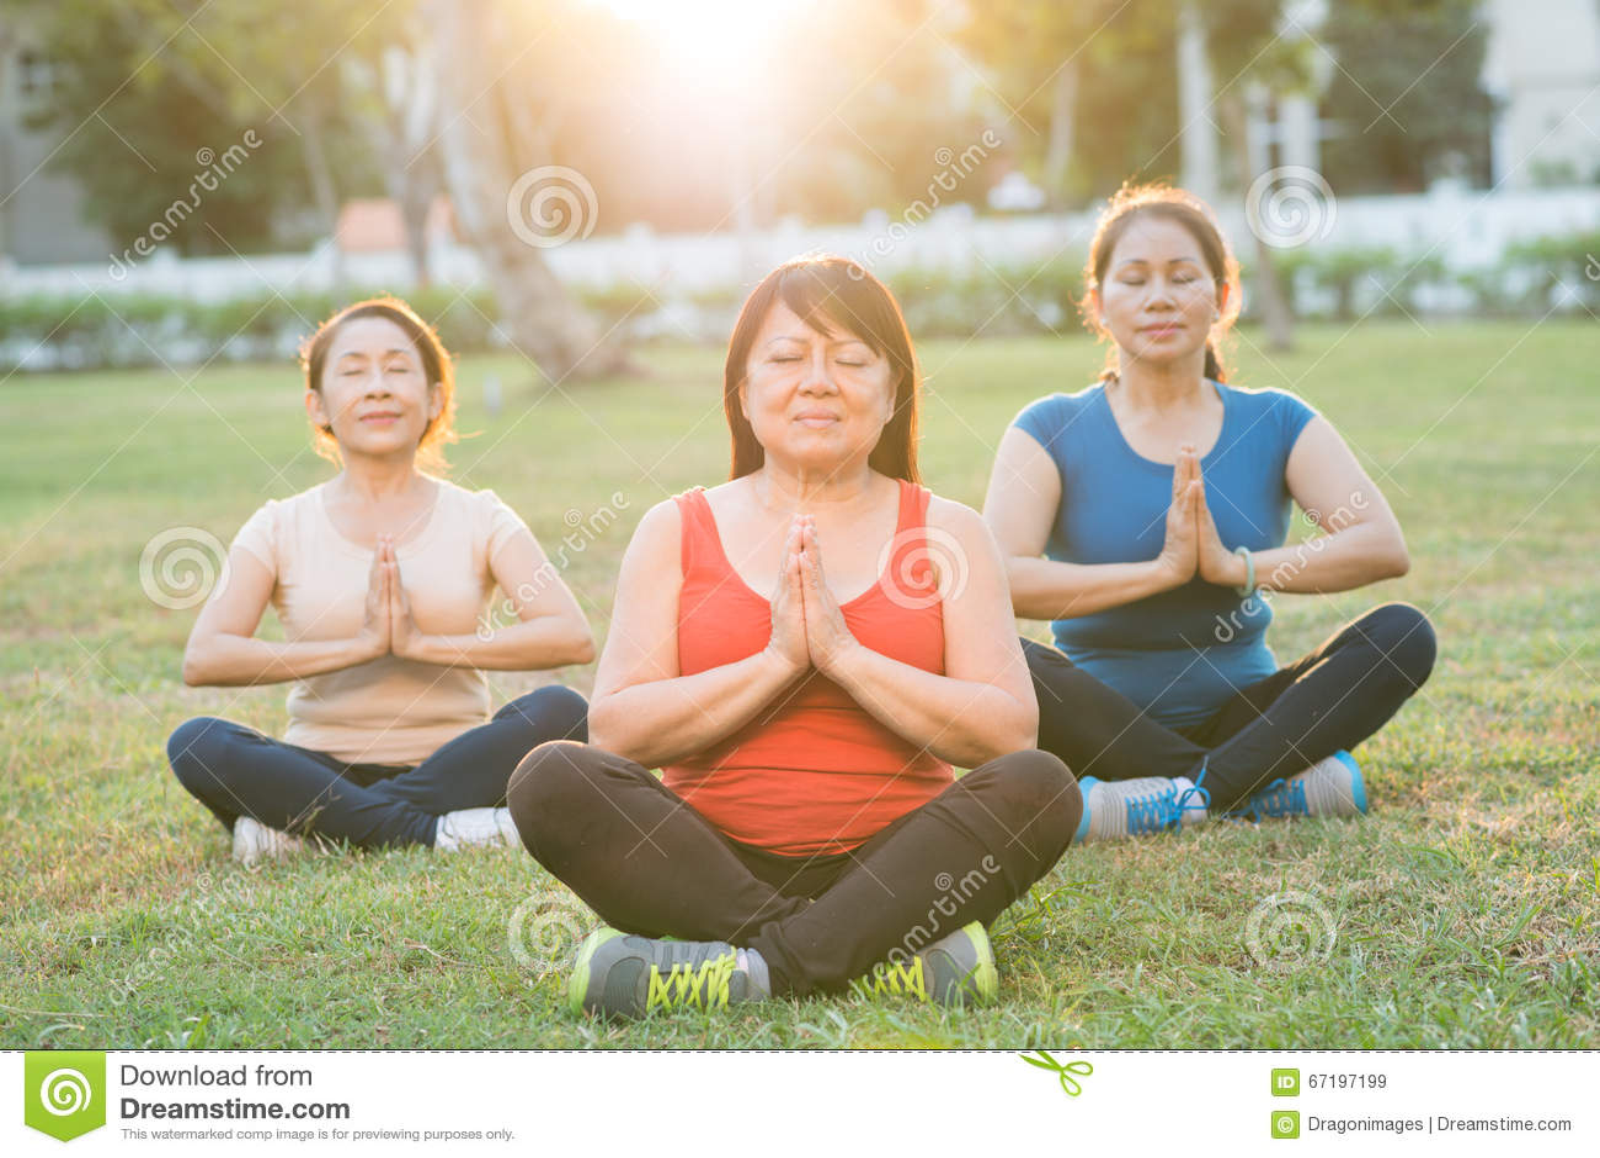 Asian mature women meditating in lotus position